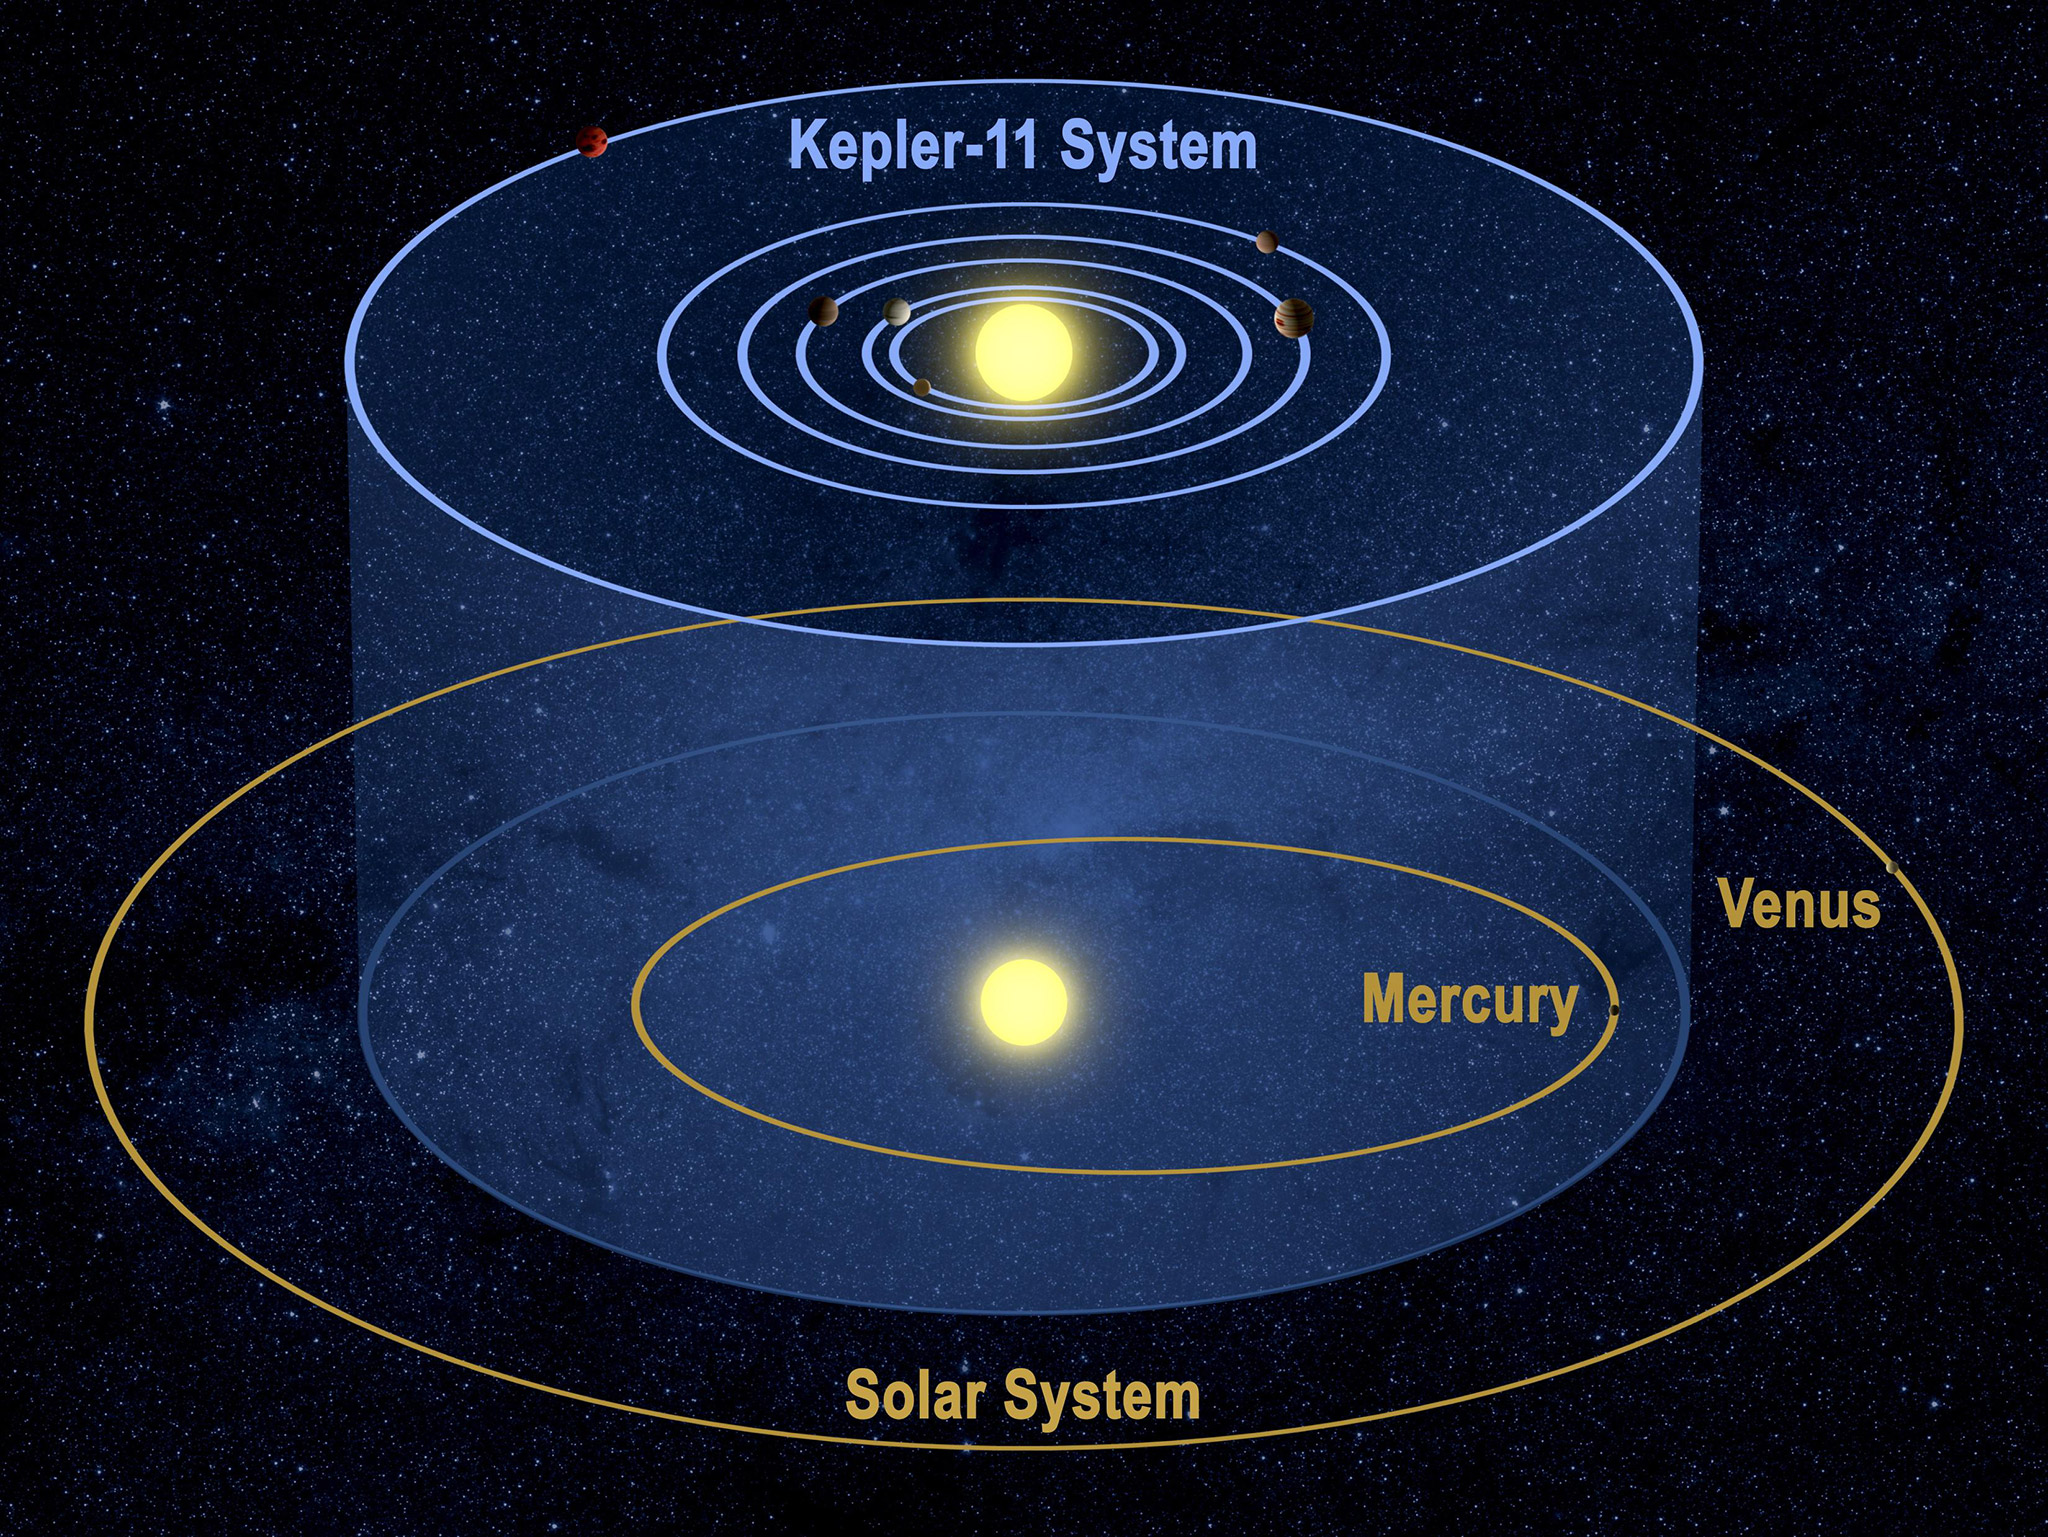 Figure 3-2a